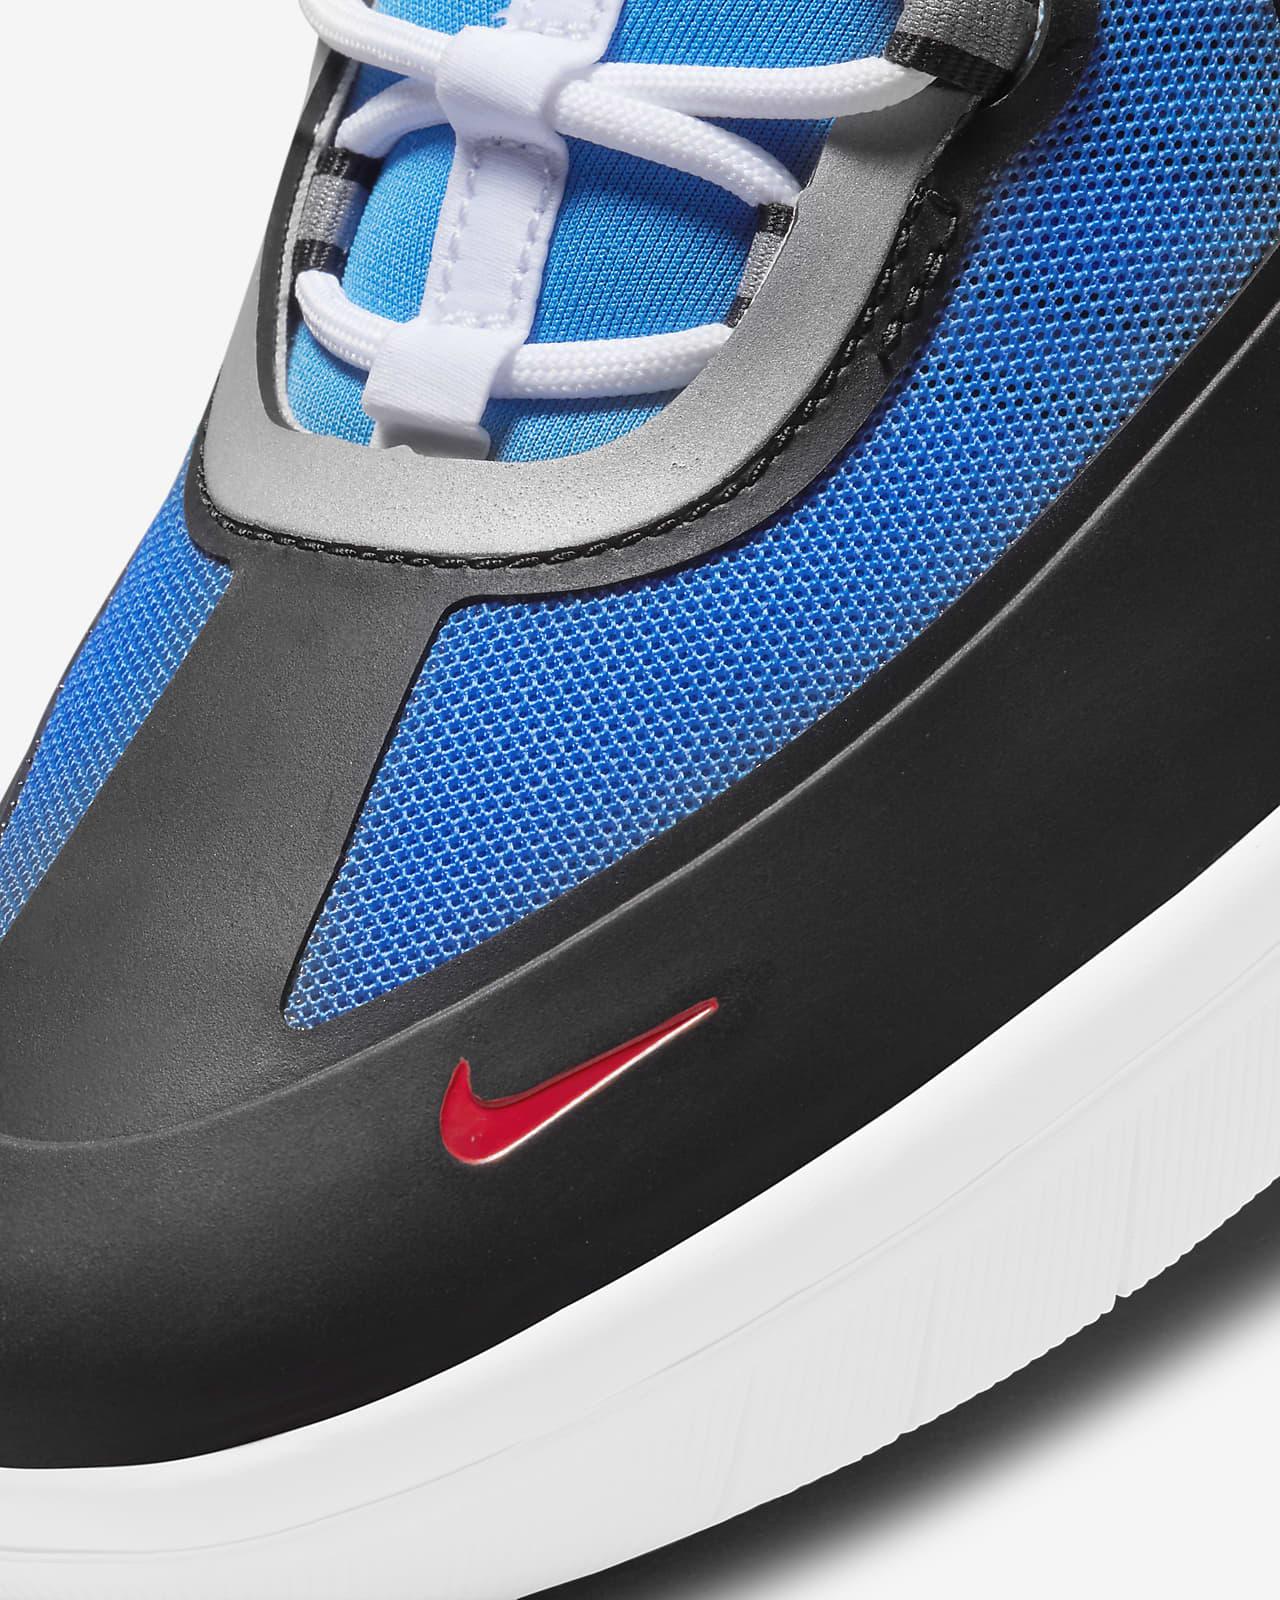 Chaussure de skateboard Nike SB Nyjah Free 2 Premium. Nike LU